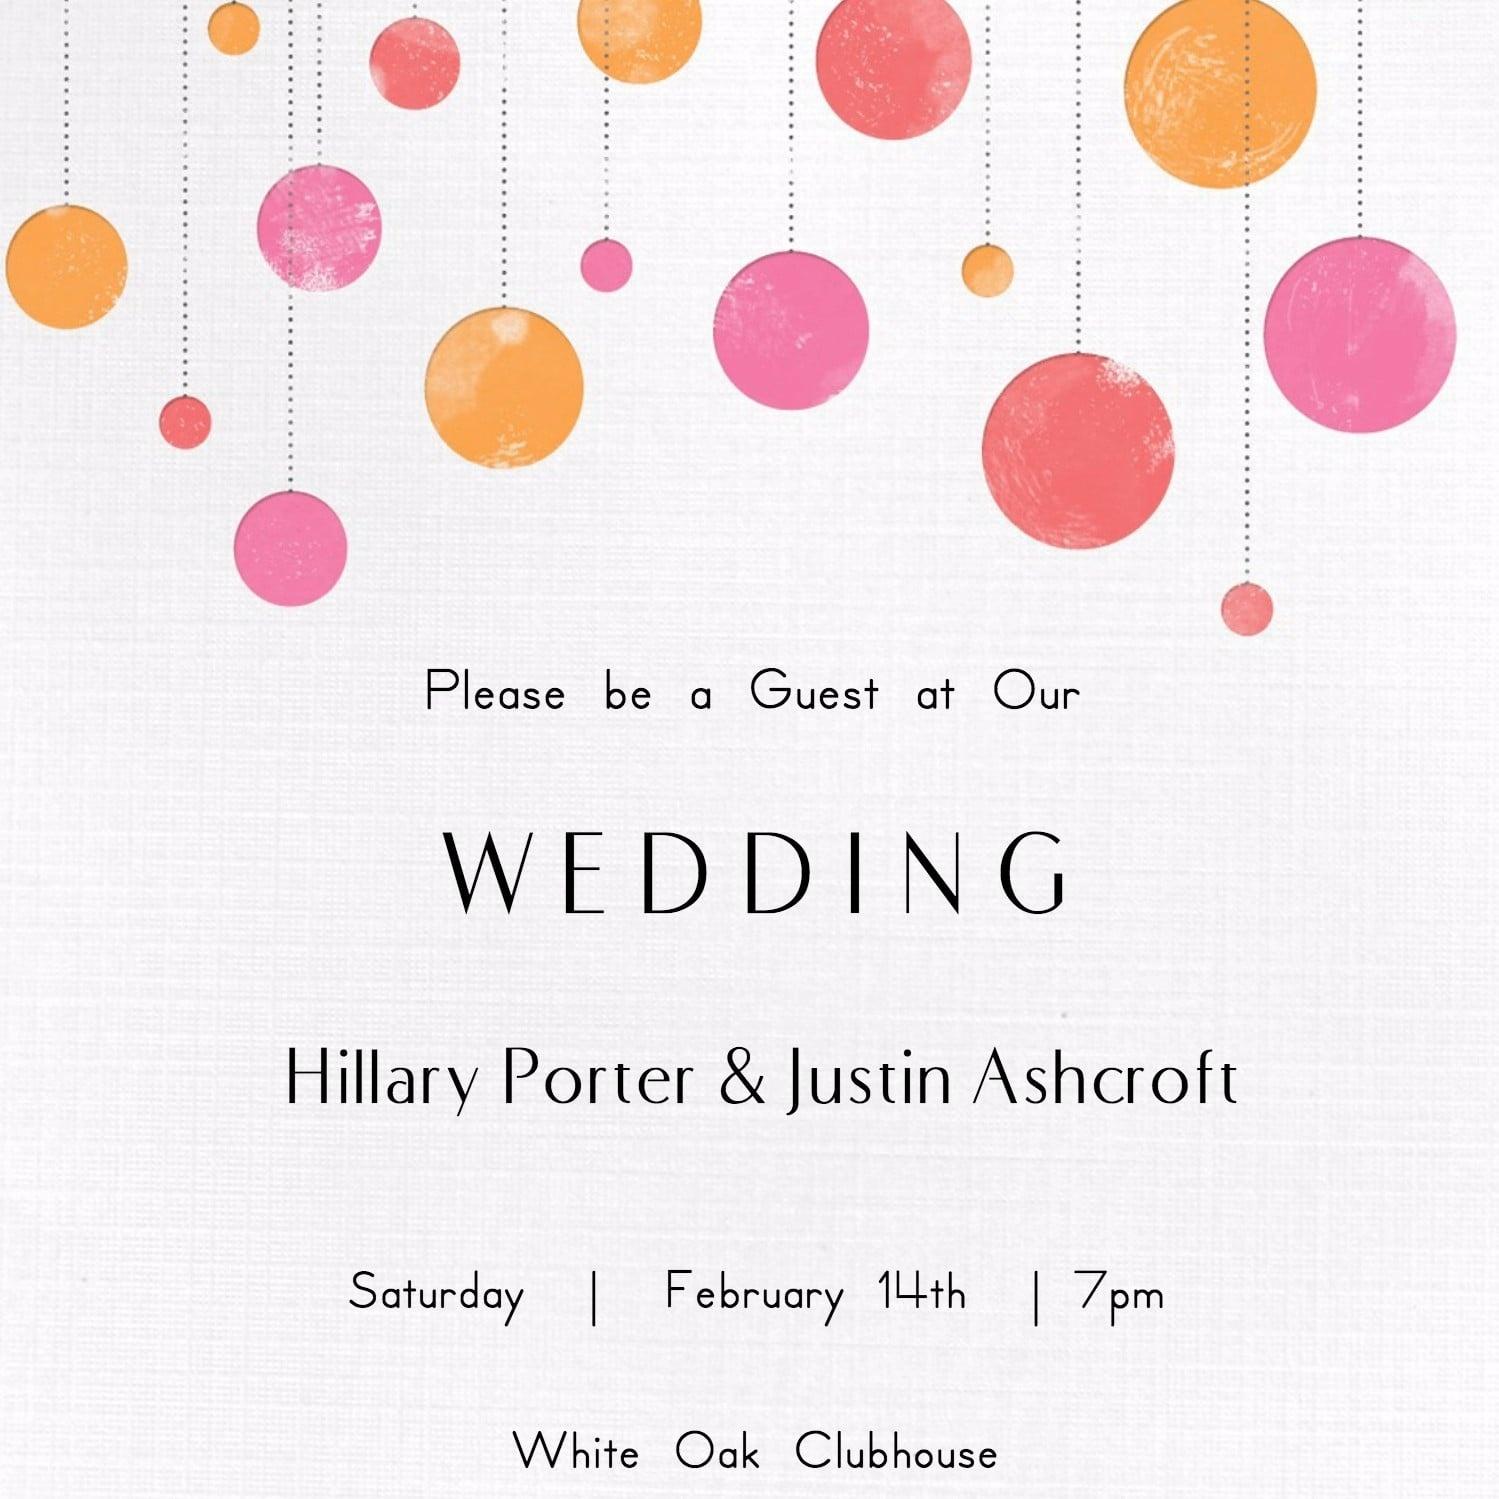 Free Printable Wedding Invitations | Popsugar Smart Living - Free Printable Halloween Wedding Invitations